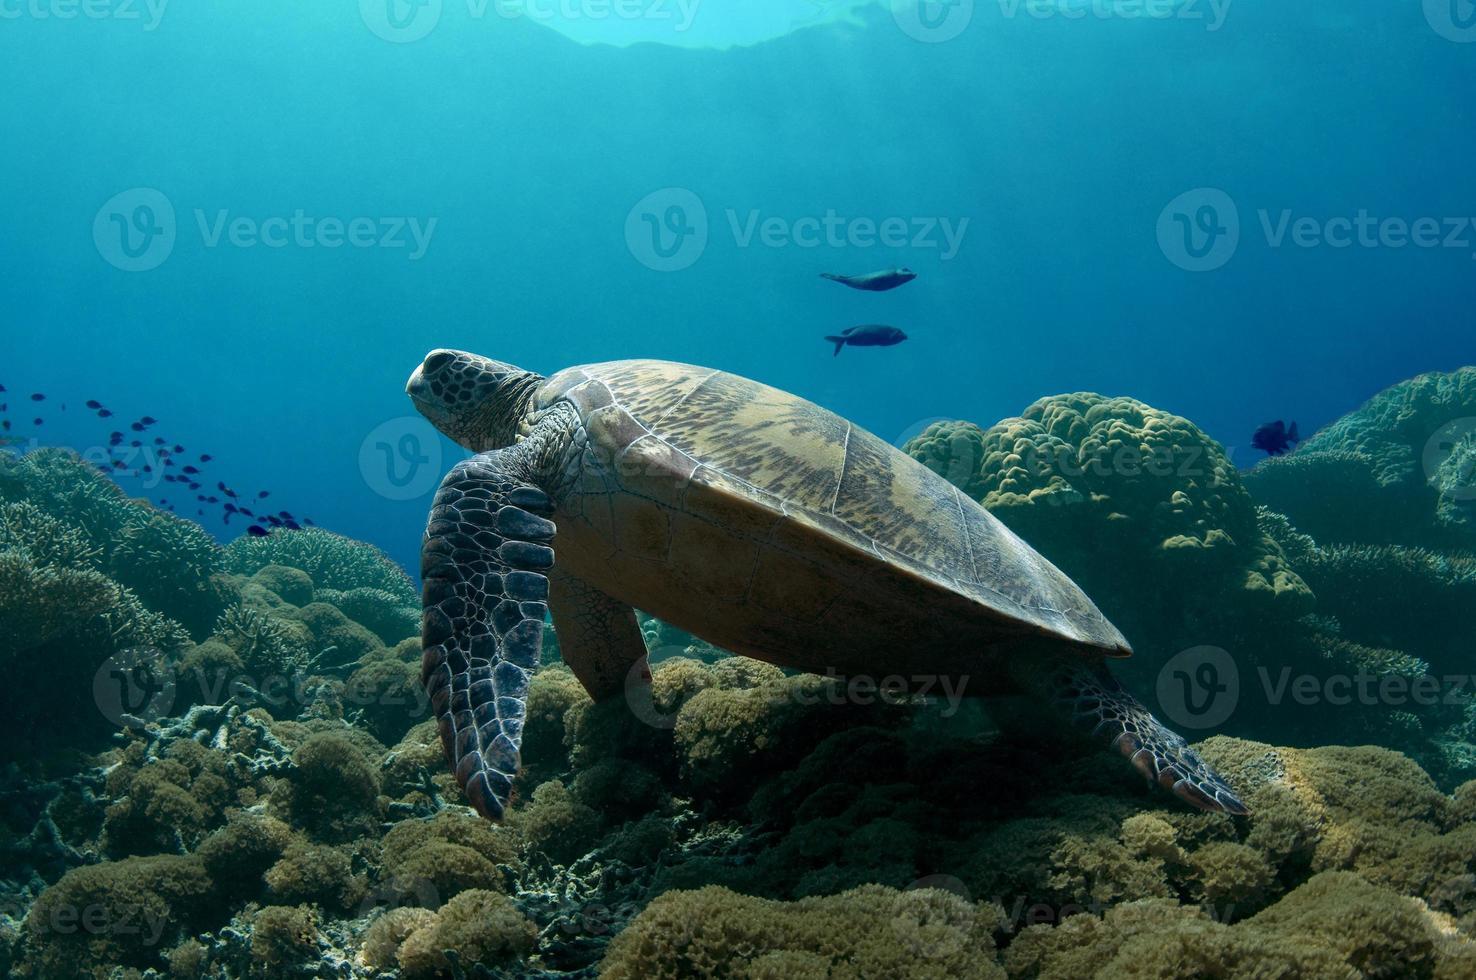 grüne Schildkröte in Ruhe foto